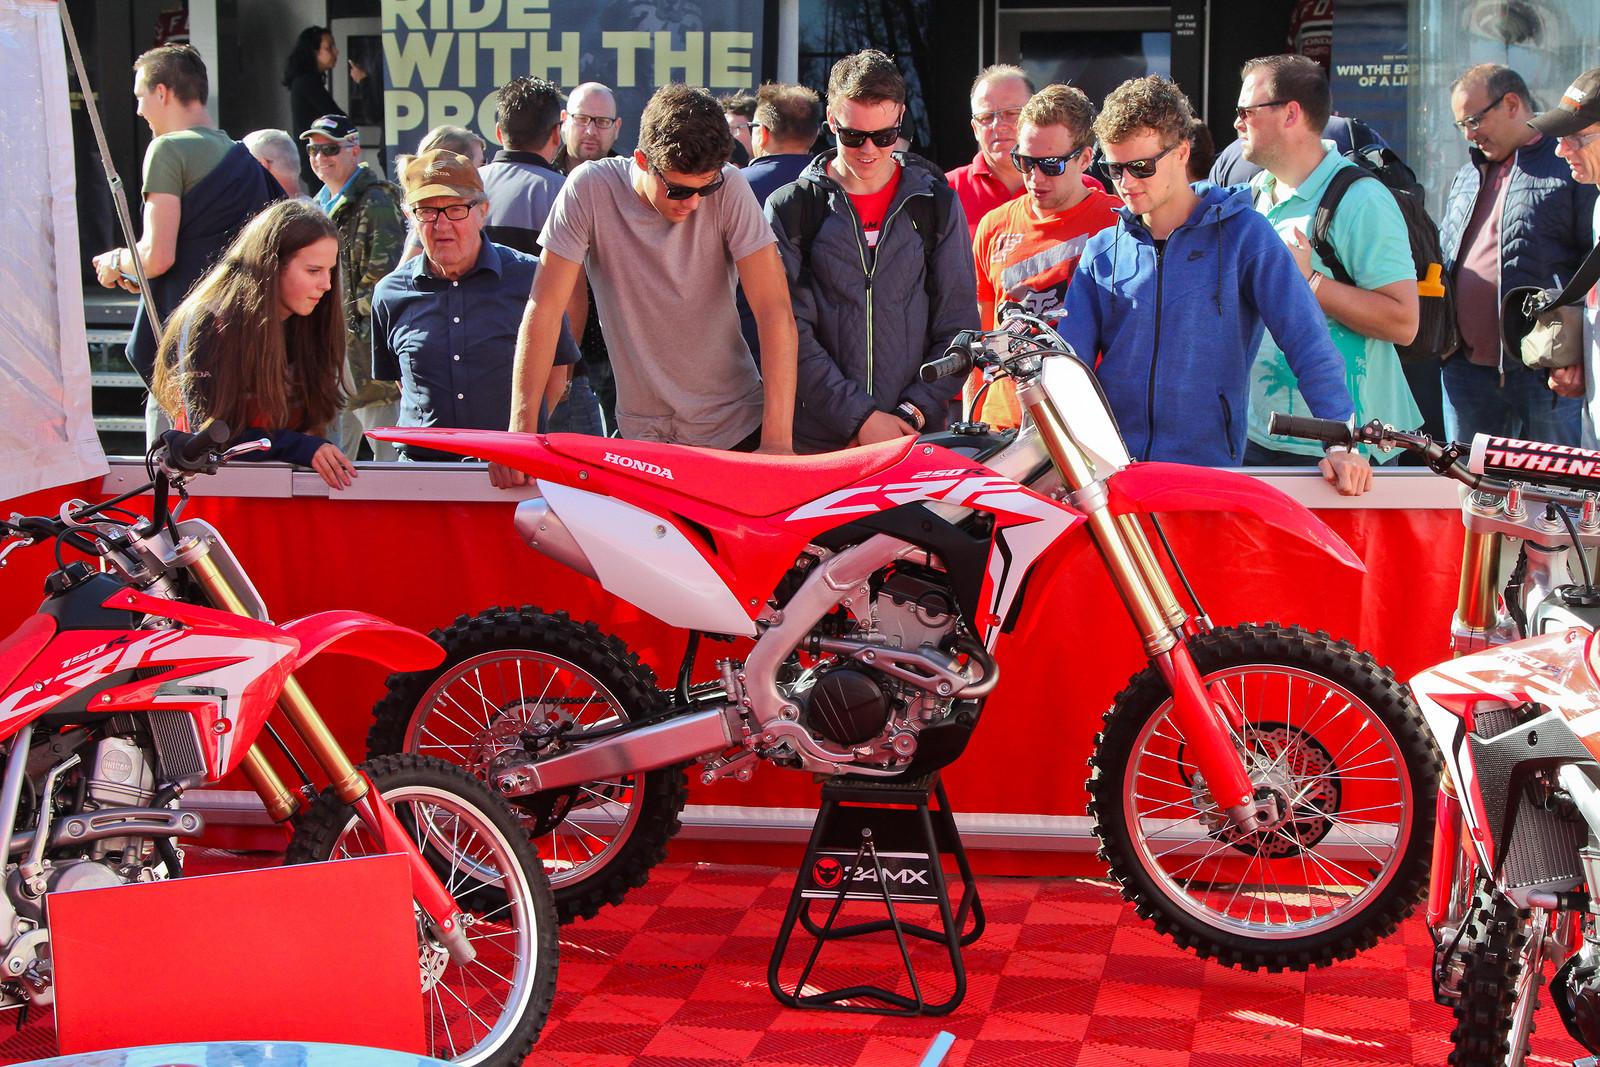 2018 Honda CR250F - ayearinmx - Motocross Pictures - Vital MX